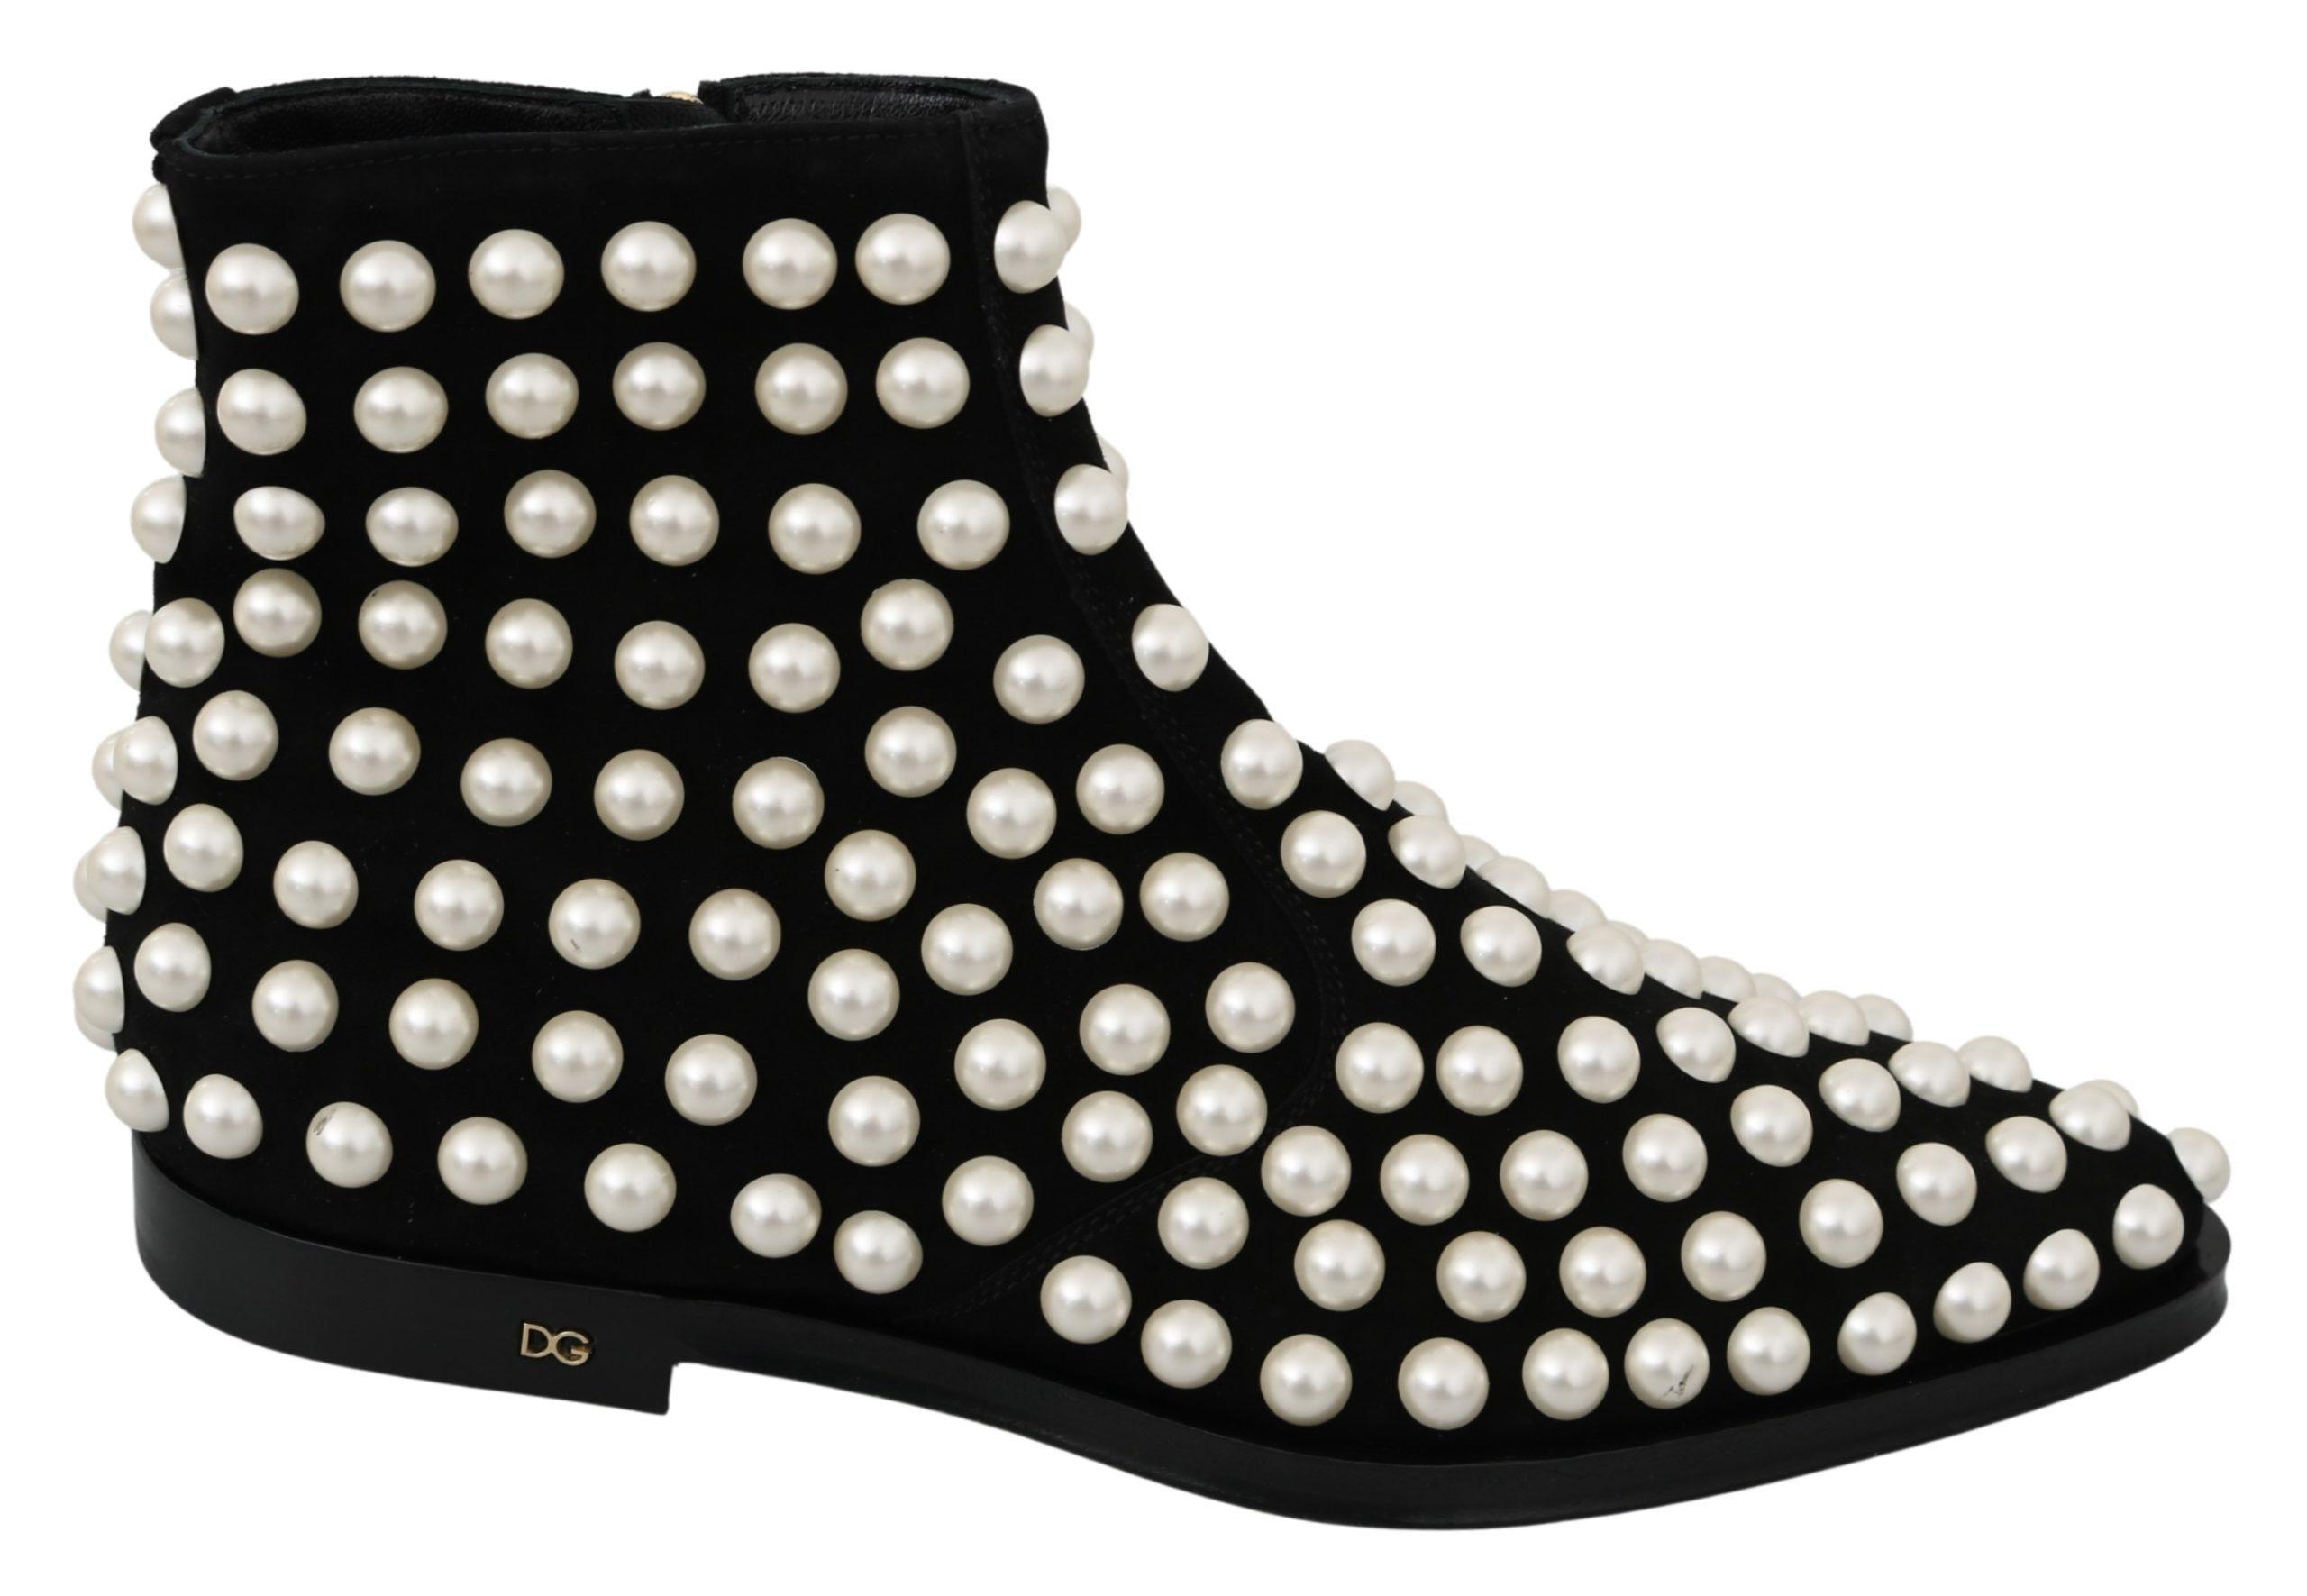 Black Suede Pearl Studs Boots Shoes - EU39/US8.5